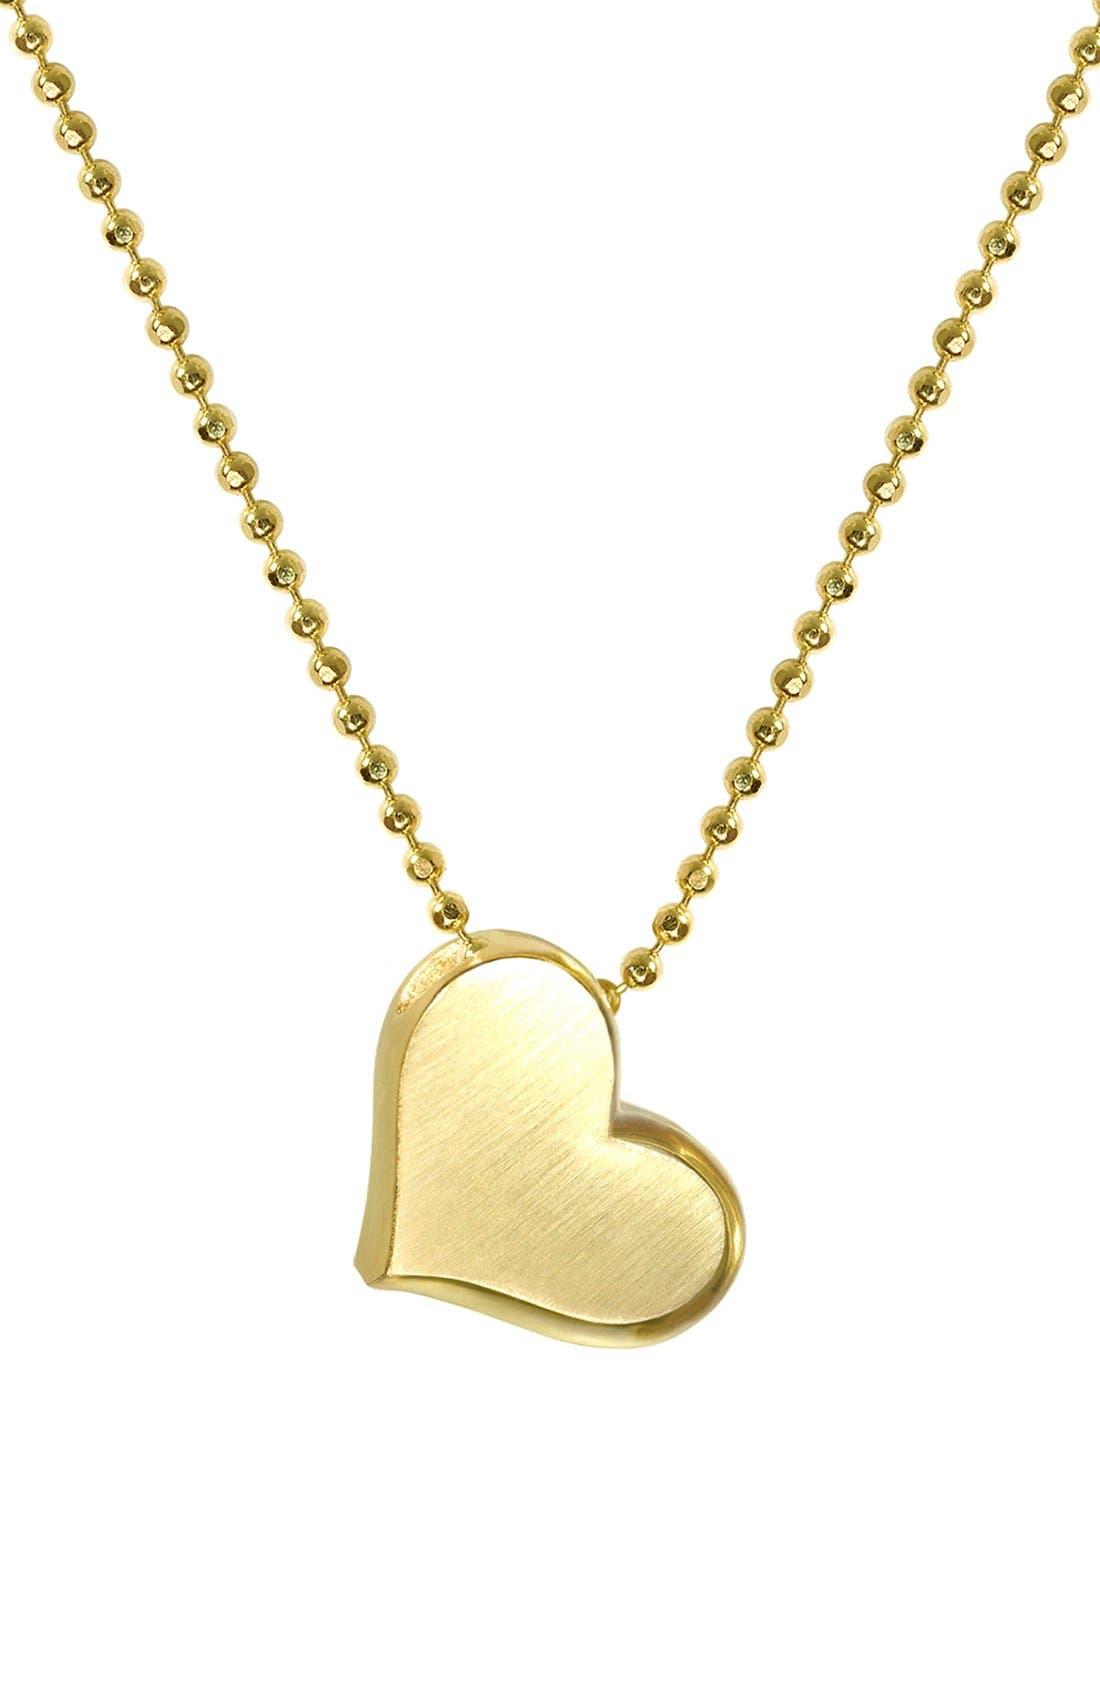 Alternate Image 1 Selected - Alex Woo 'Little Princess' Heart Pendant Necklace